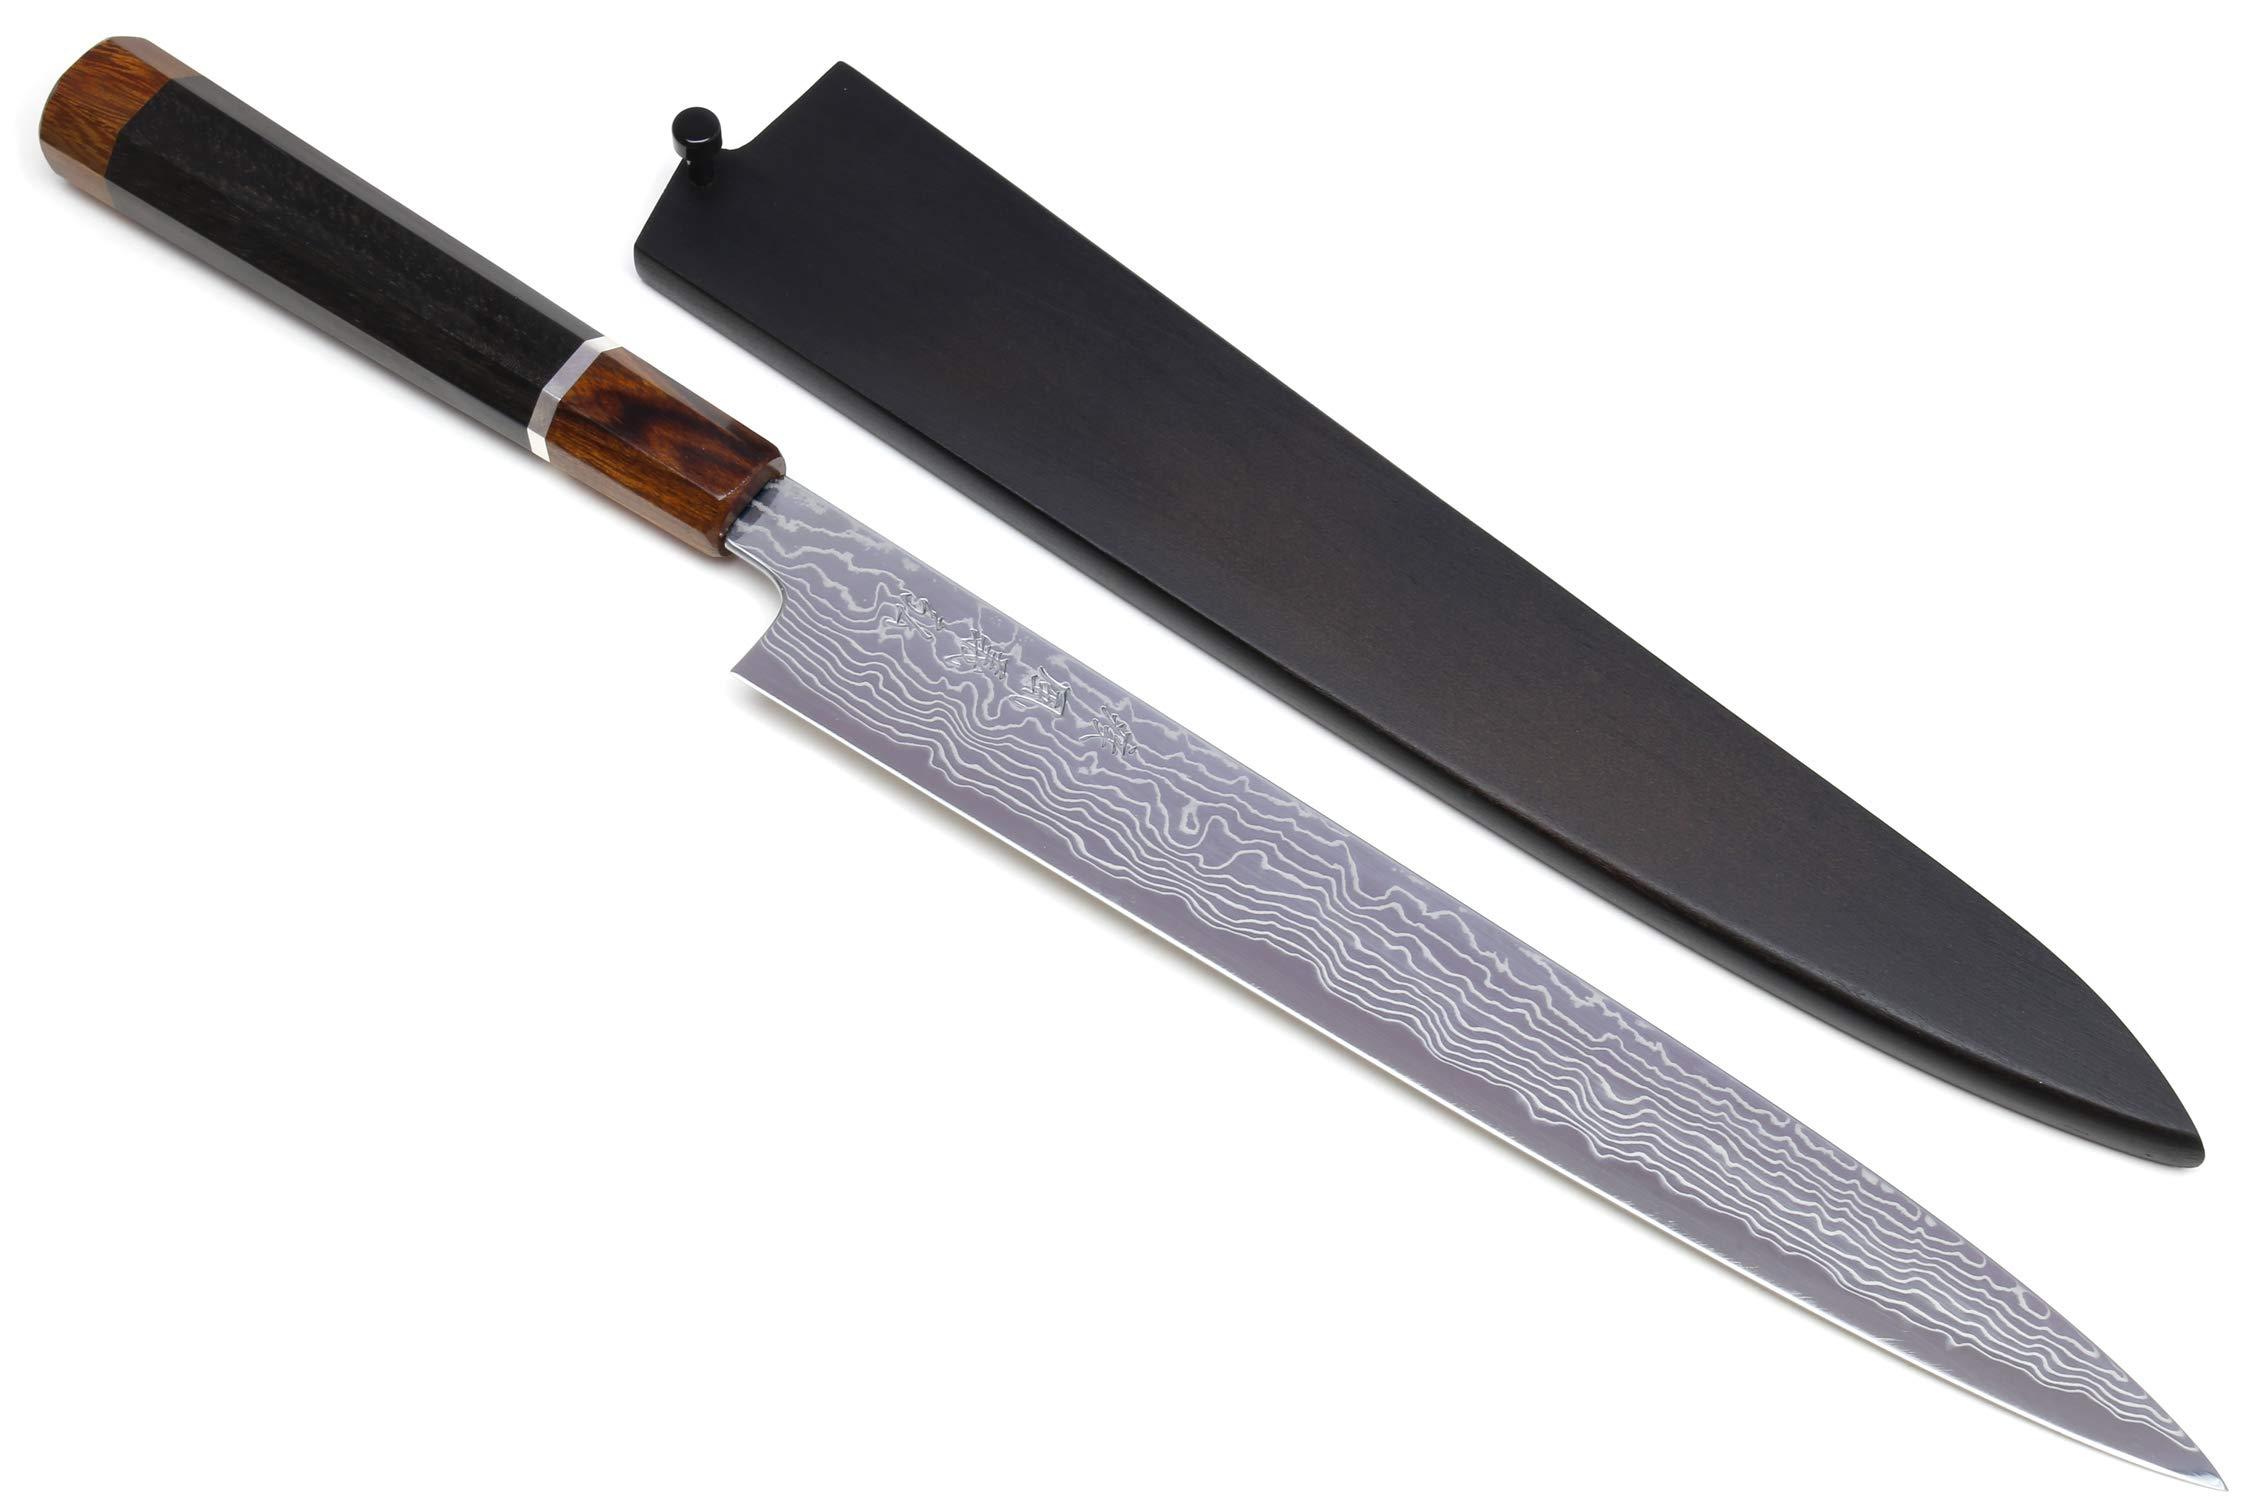 Yoshihiro Hayate ZDP-189 Super High Carbon Stainless Steel Suminagashi Damascus Sujihiki Slicer Knife Octagonal Ebony Wood Handle with Sterling Silver Ring (10.5 IN)